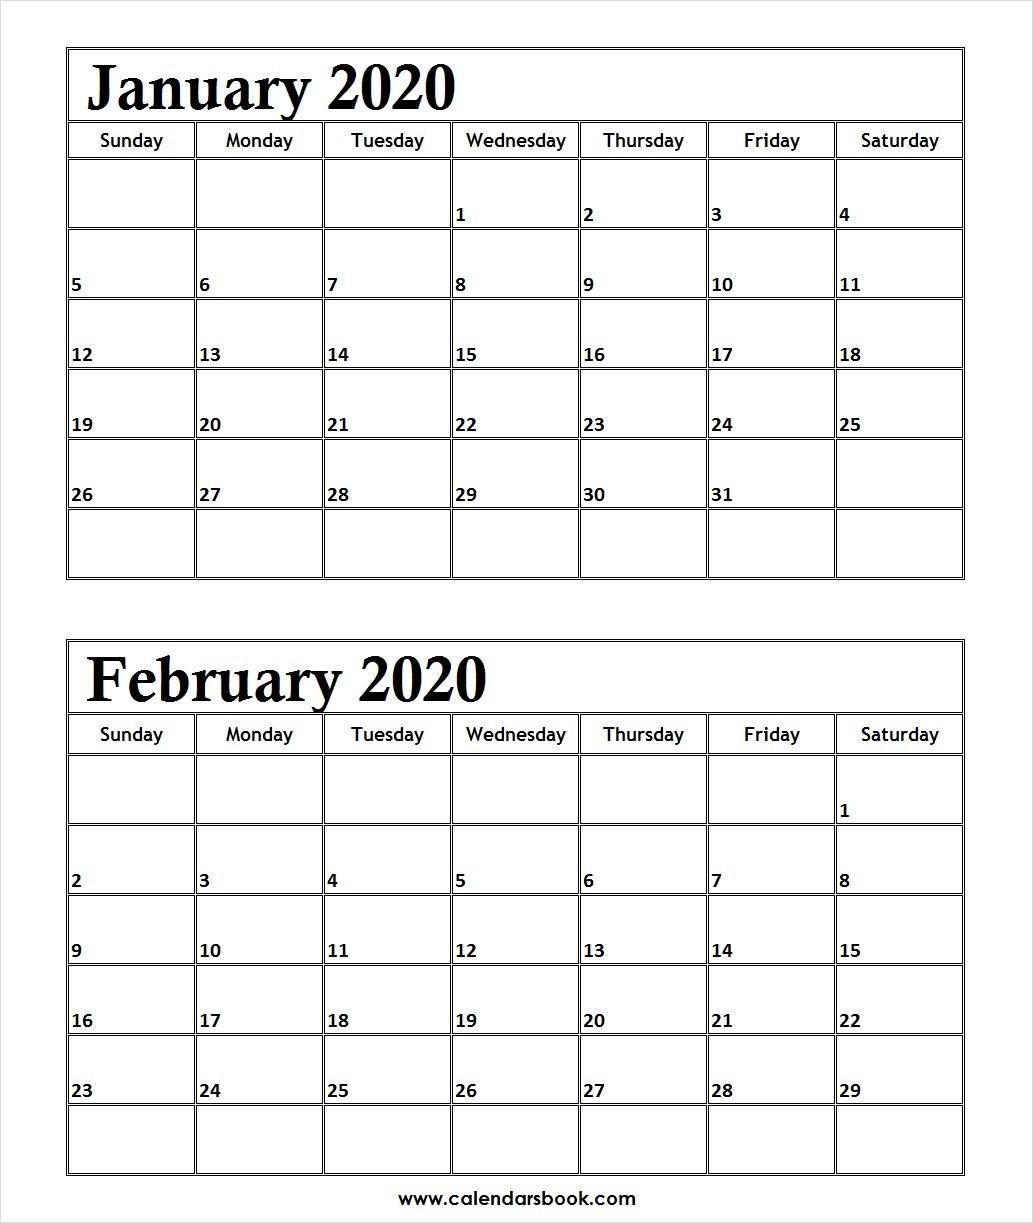 Print January February 2020 Calendar Template | 2 Month Calendar-January Feb 2020 Calendar